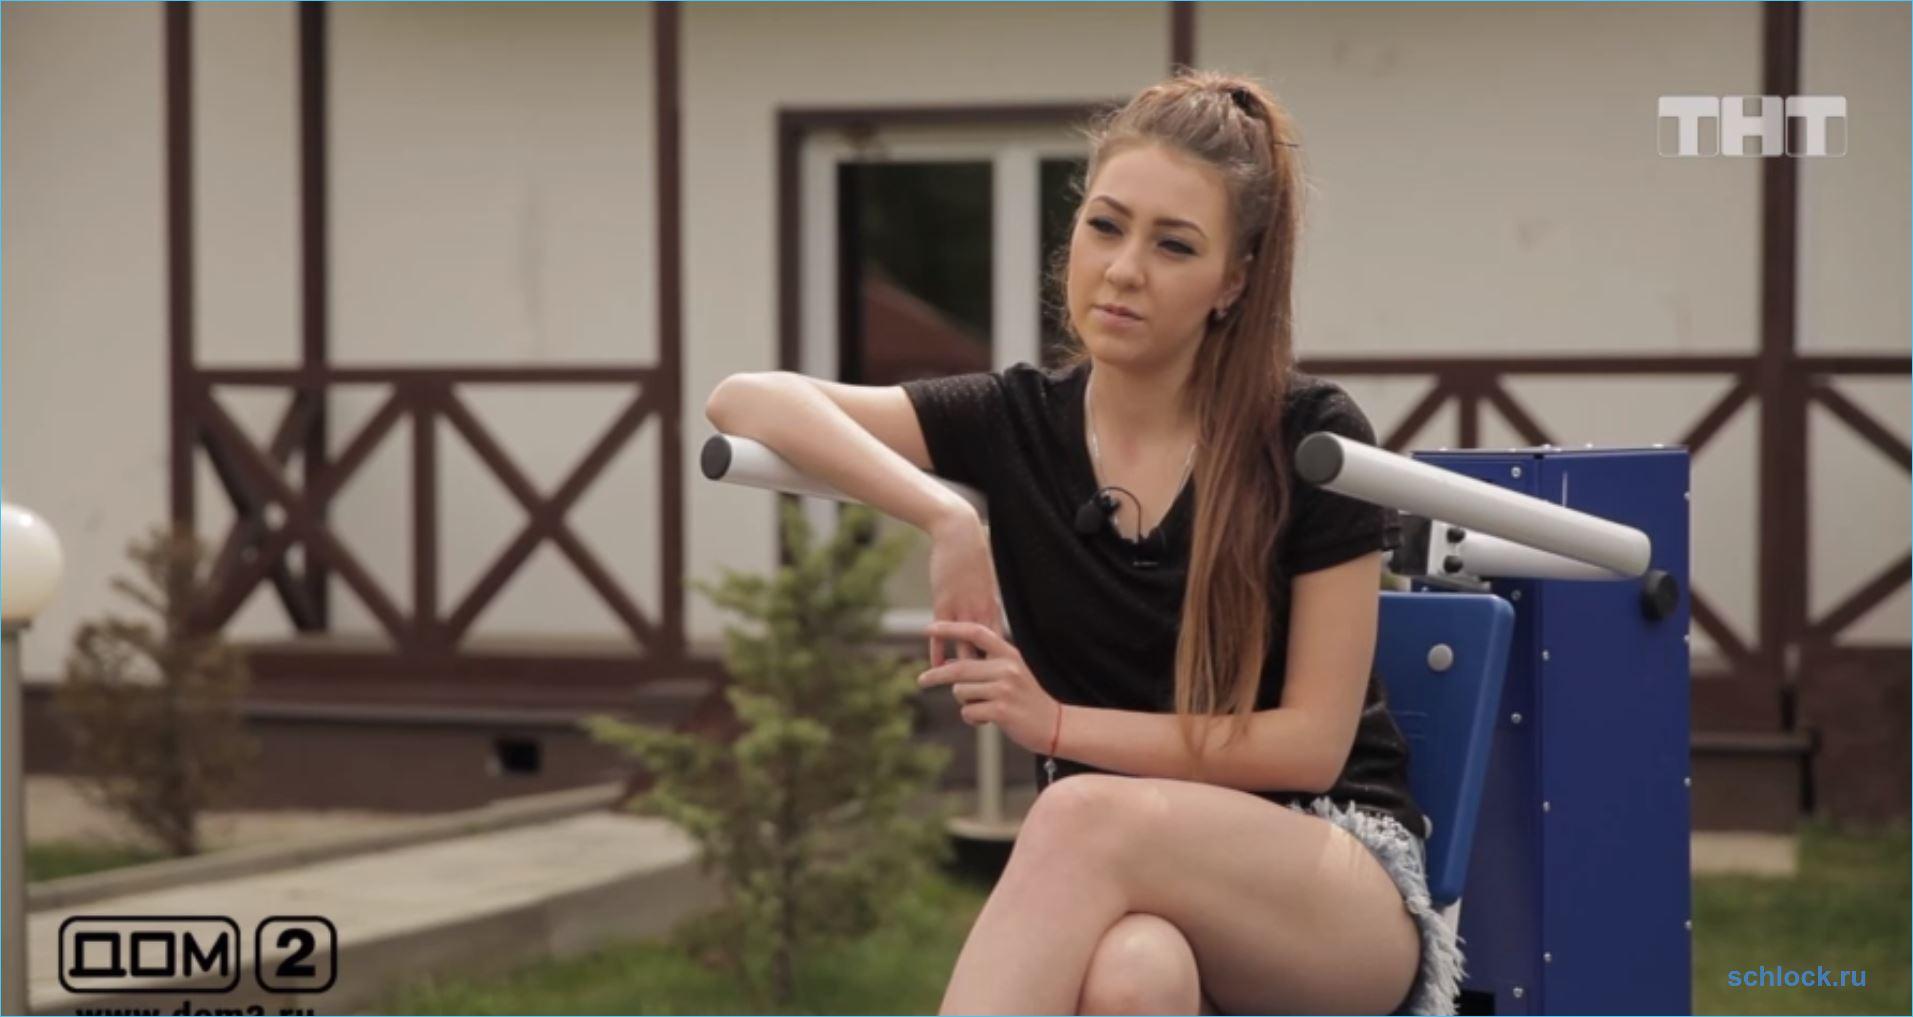 Савкина оправдала ленивого Яббарова